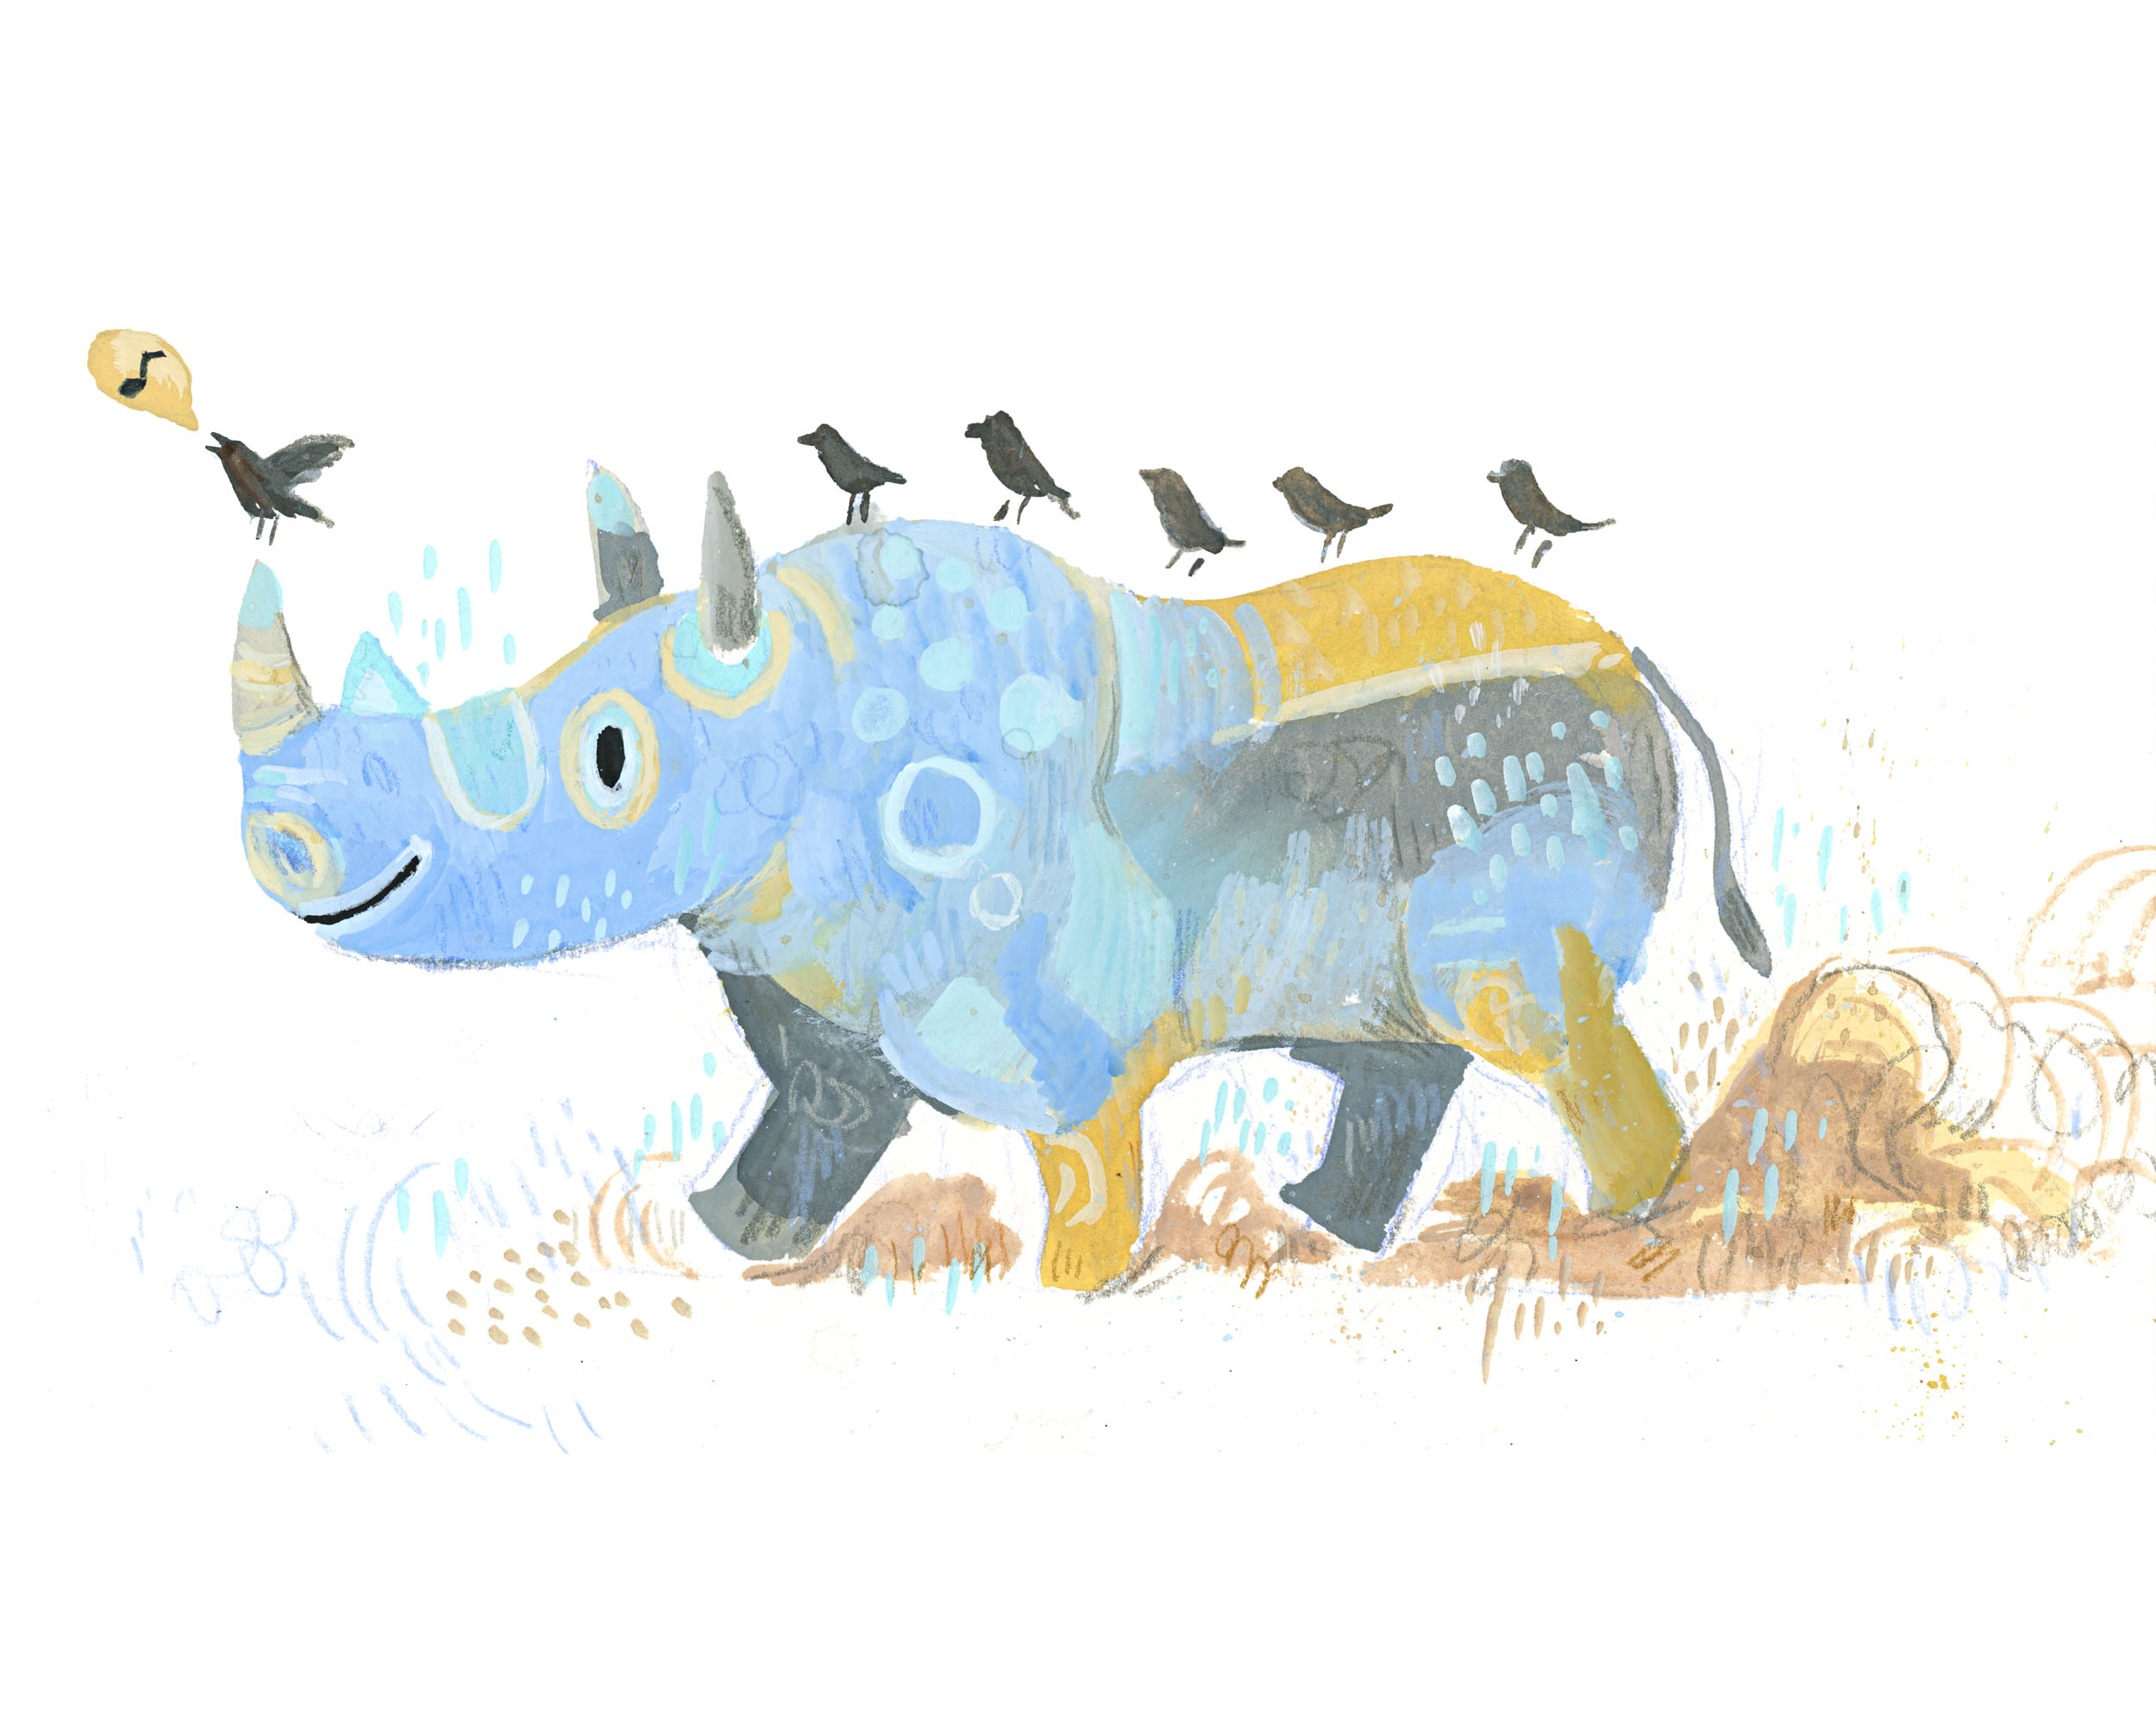 BeastsAndBirds_Rhino_001 copy.jpg